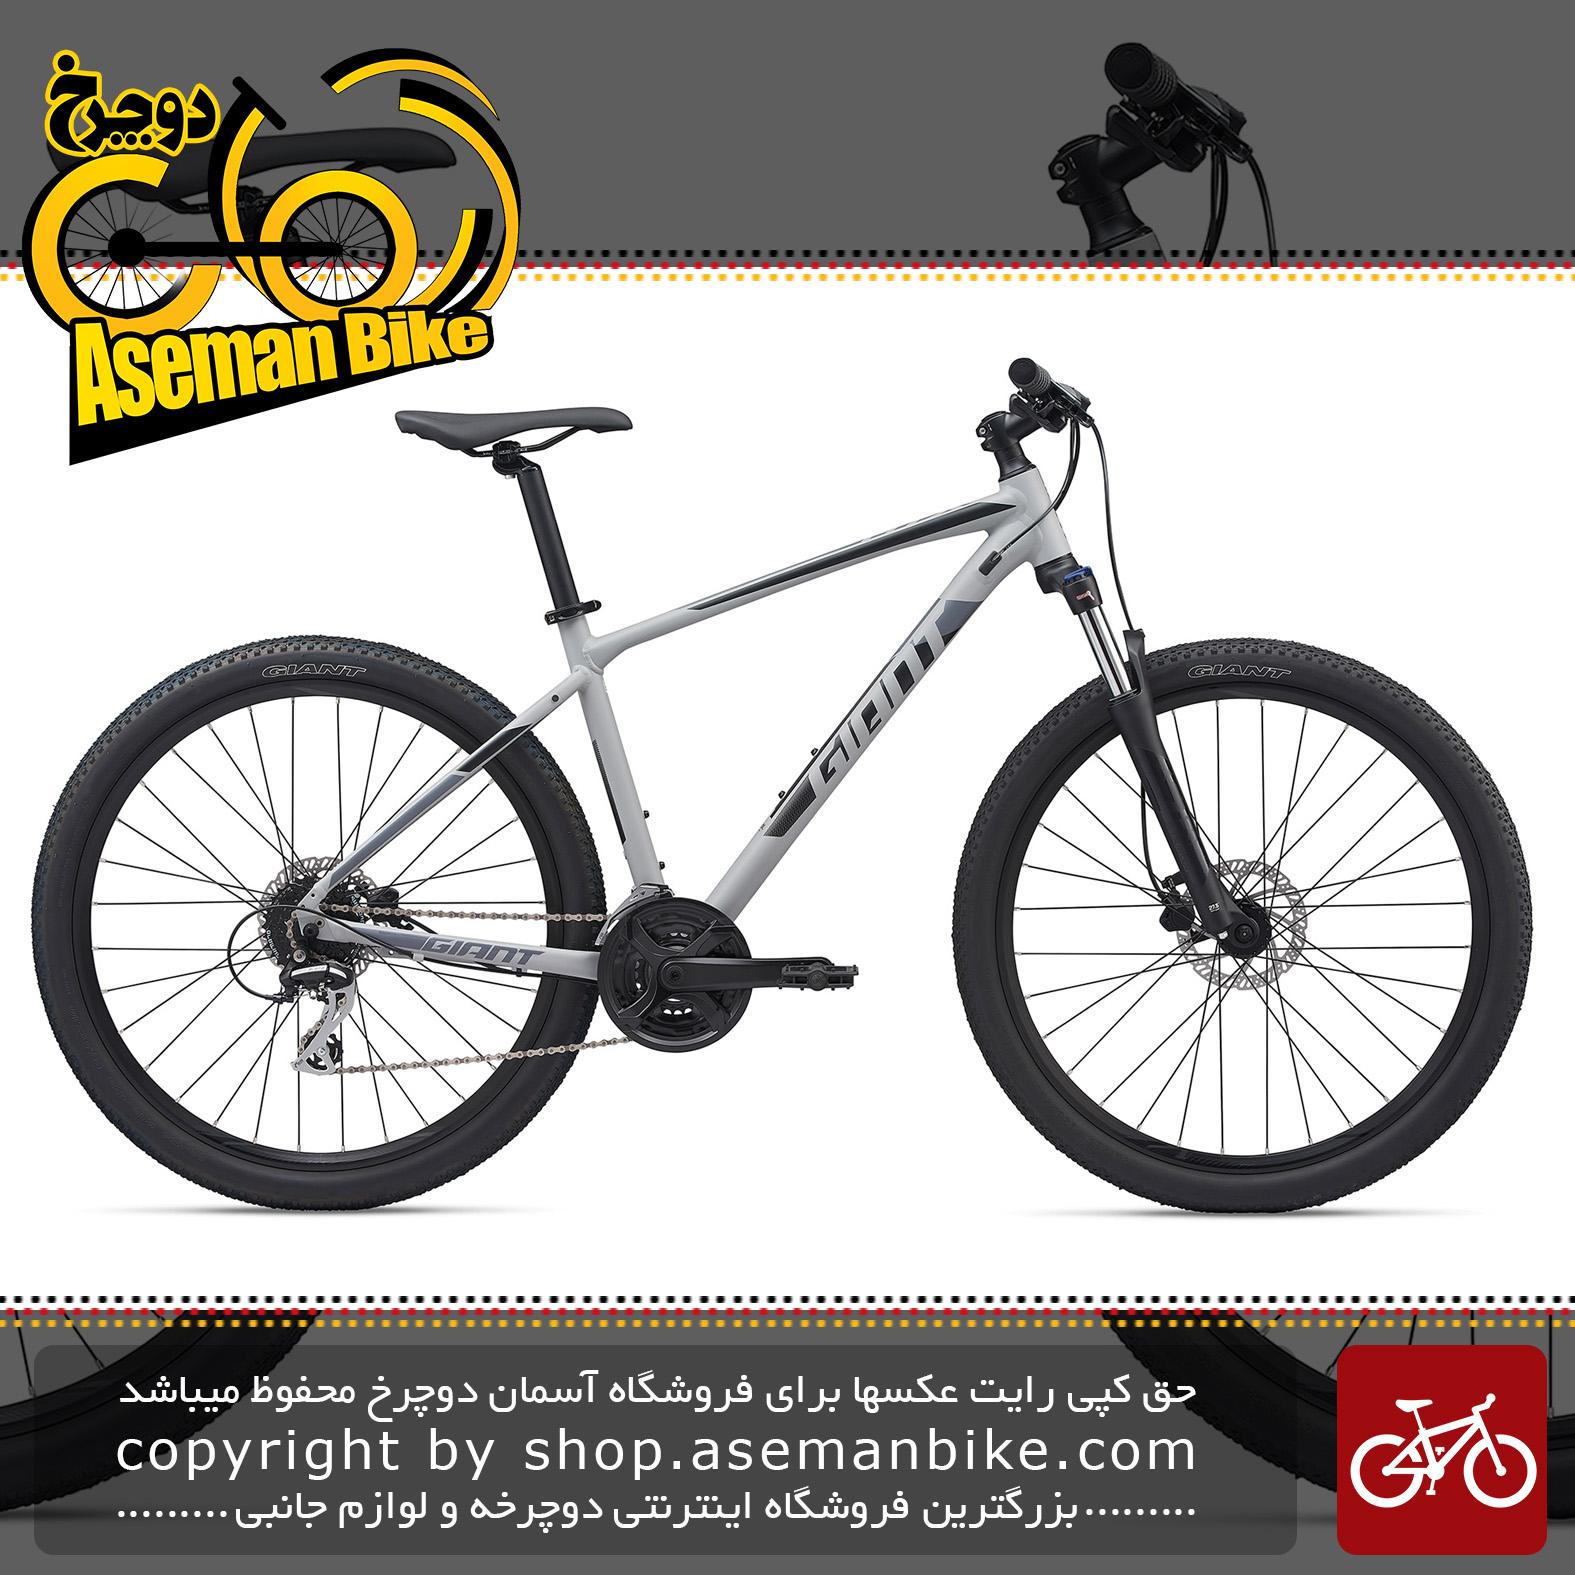 دوچرخه کوهستان جاینت مدل ای تی ایکس 1 (جی ای) 2020 Giant Mountain Bicycle ATX 1 (GE) 2020